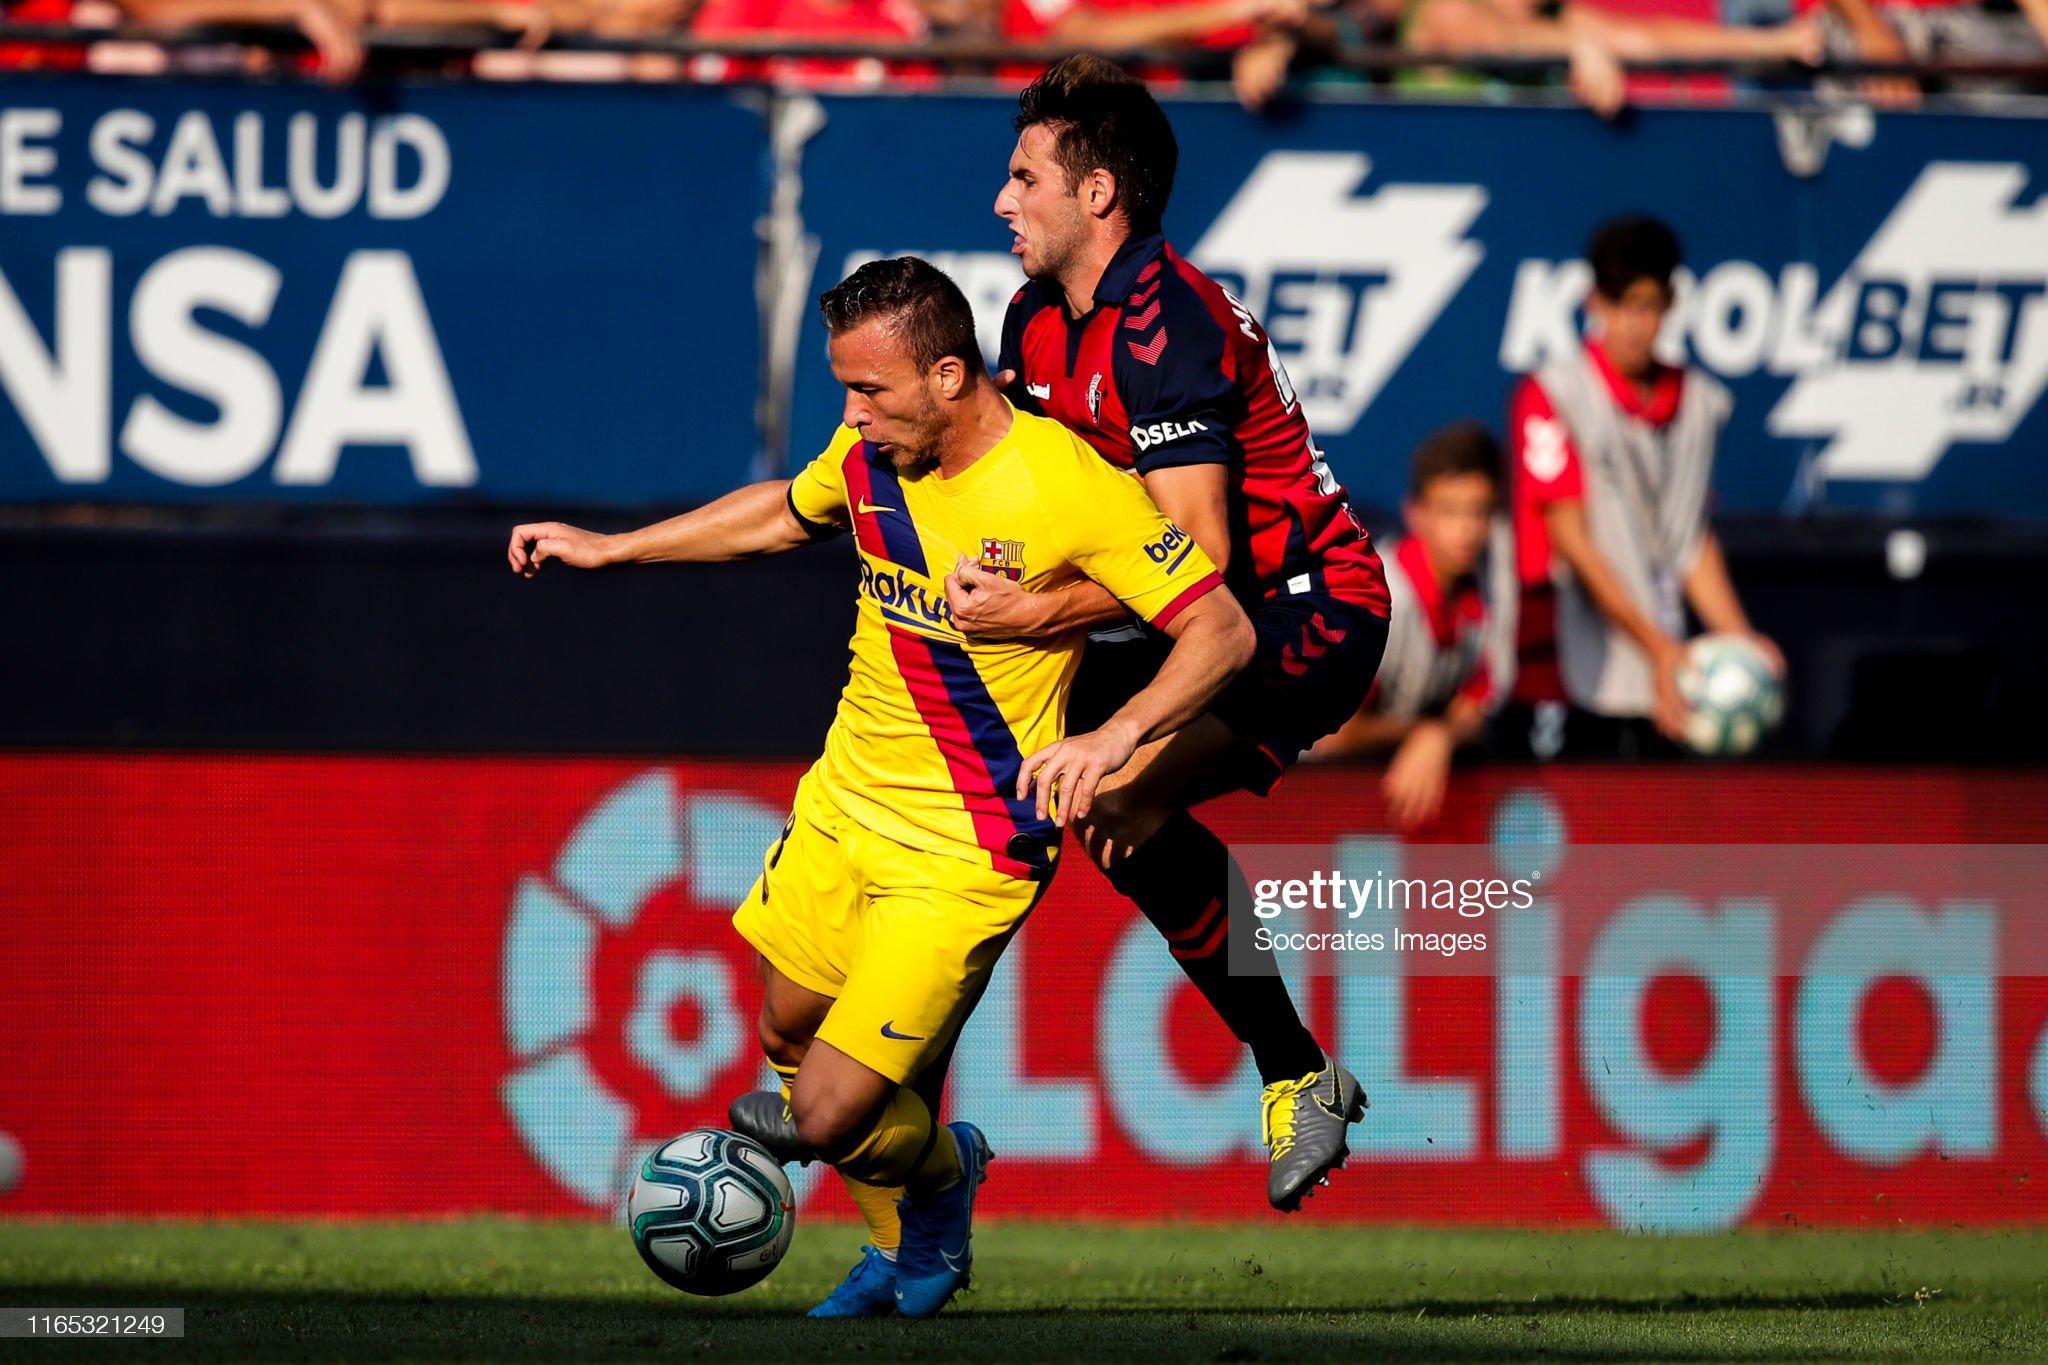 صور مباراة : أوساسونا - برشلونة 2-2 ( 31-08-2019 )  Arthur-of-fc-barcelona-nacho-vidal-of-ca-osasuna-during-the-la-liga-picture-id1165321249?s=2048x2048